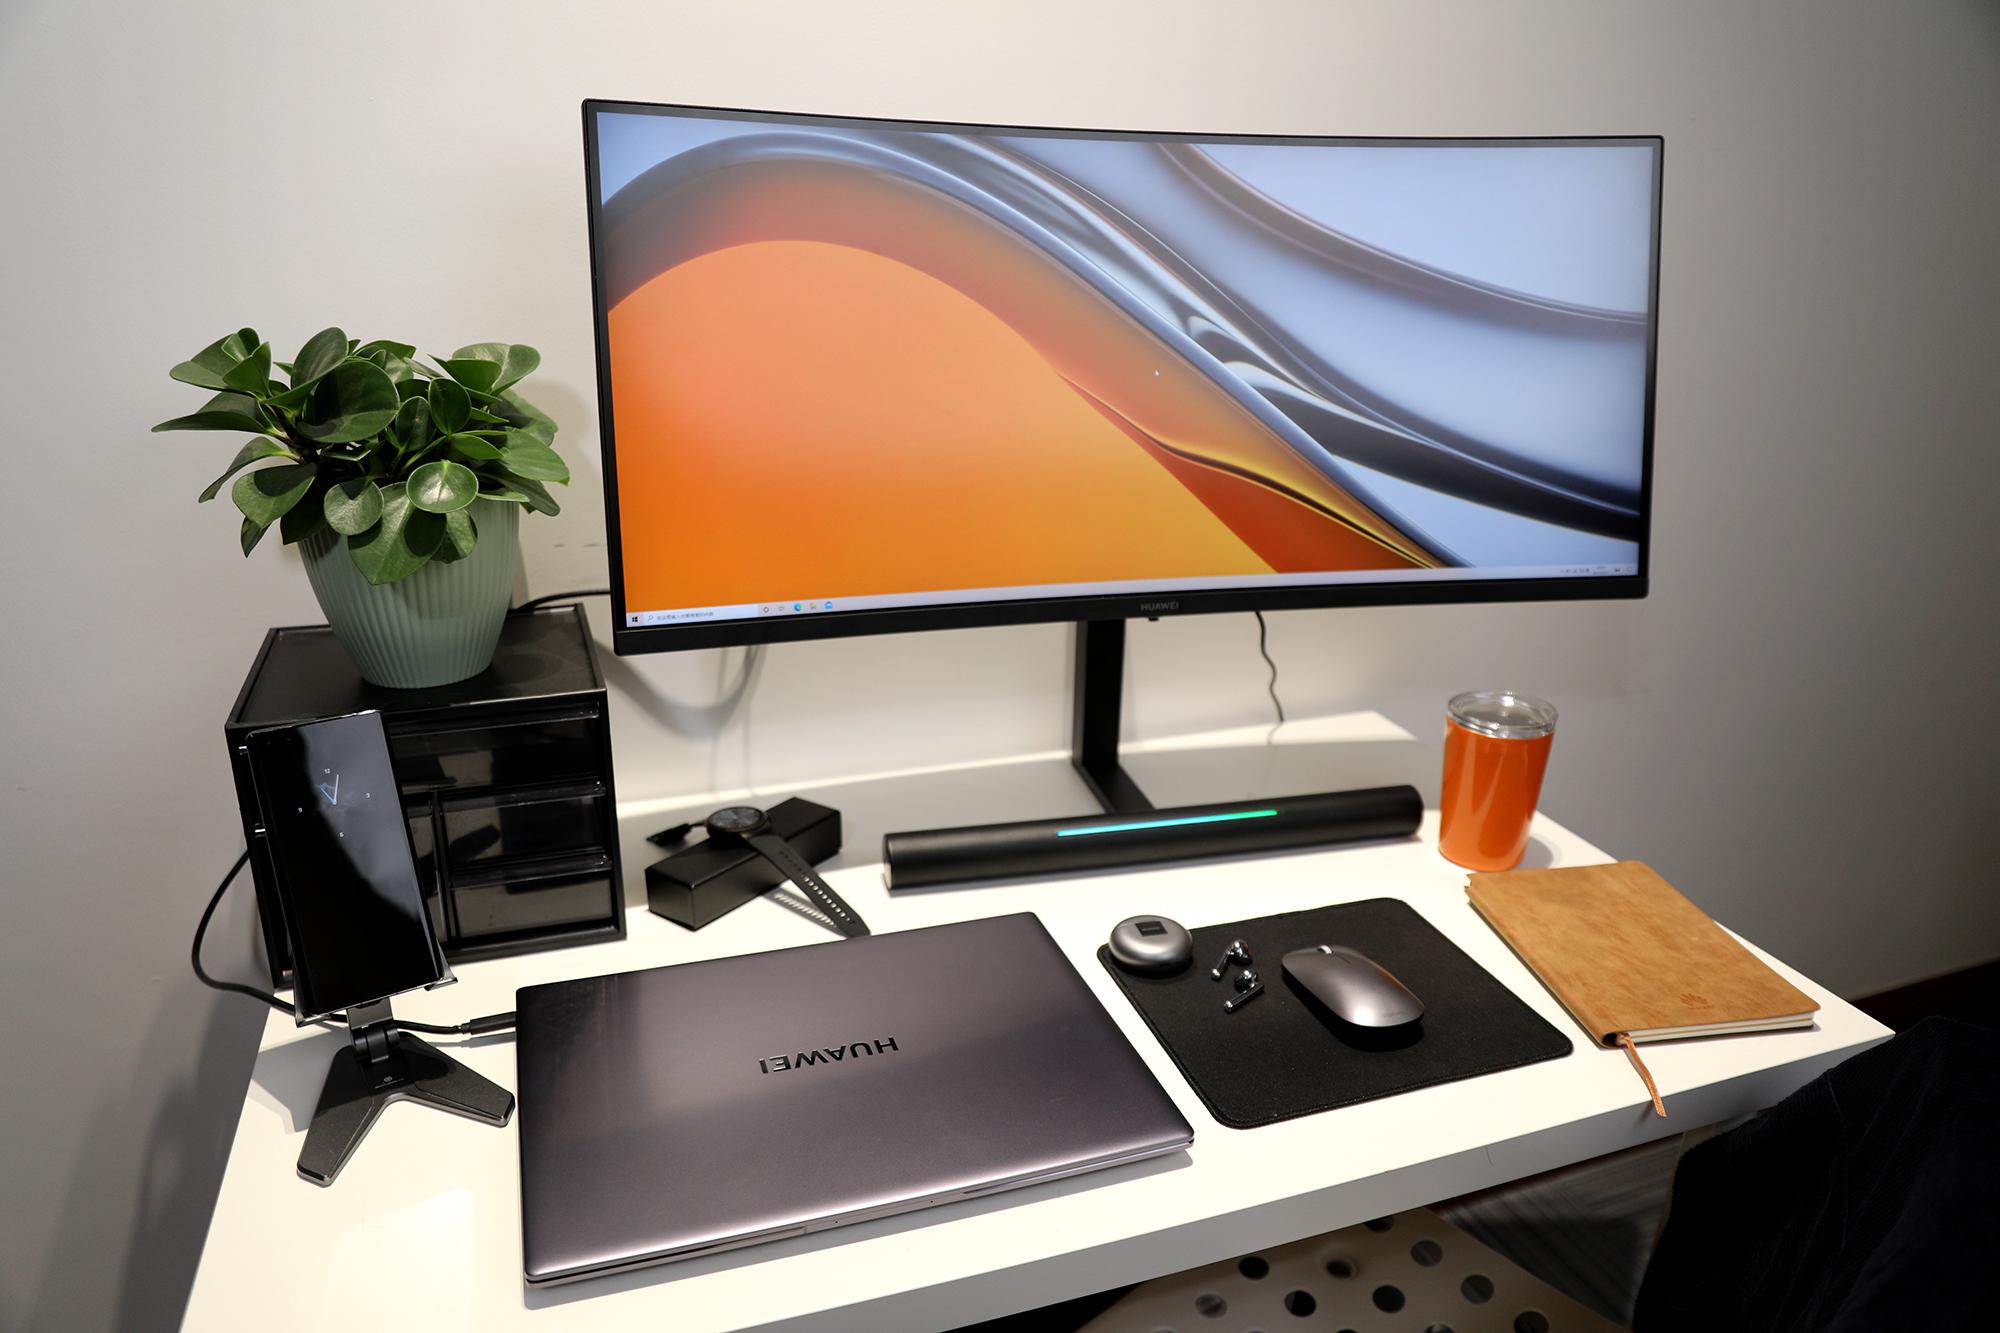 Arrancó preventa de los monitores para computador: Huawei MateView y MateView GT | EL FRENTE